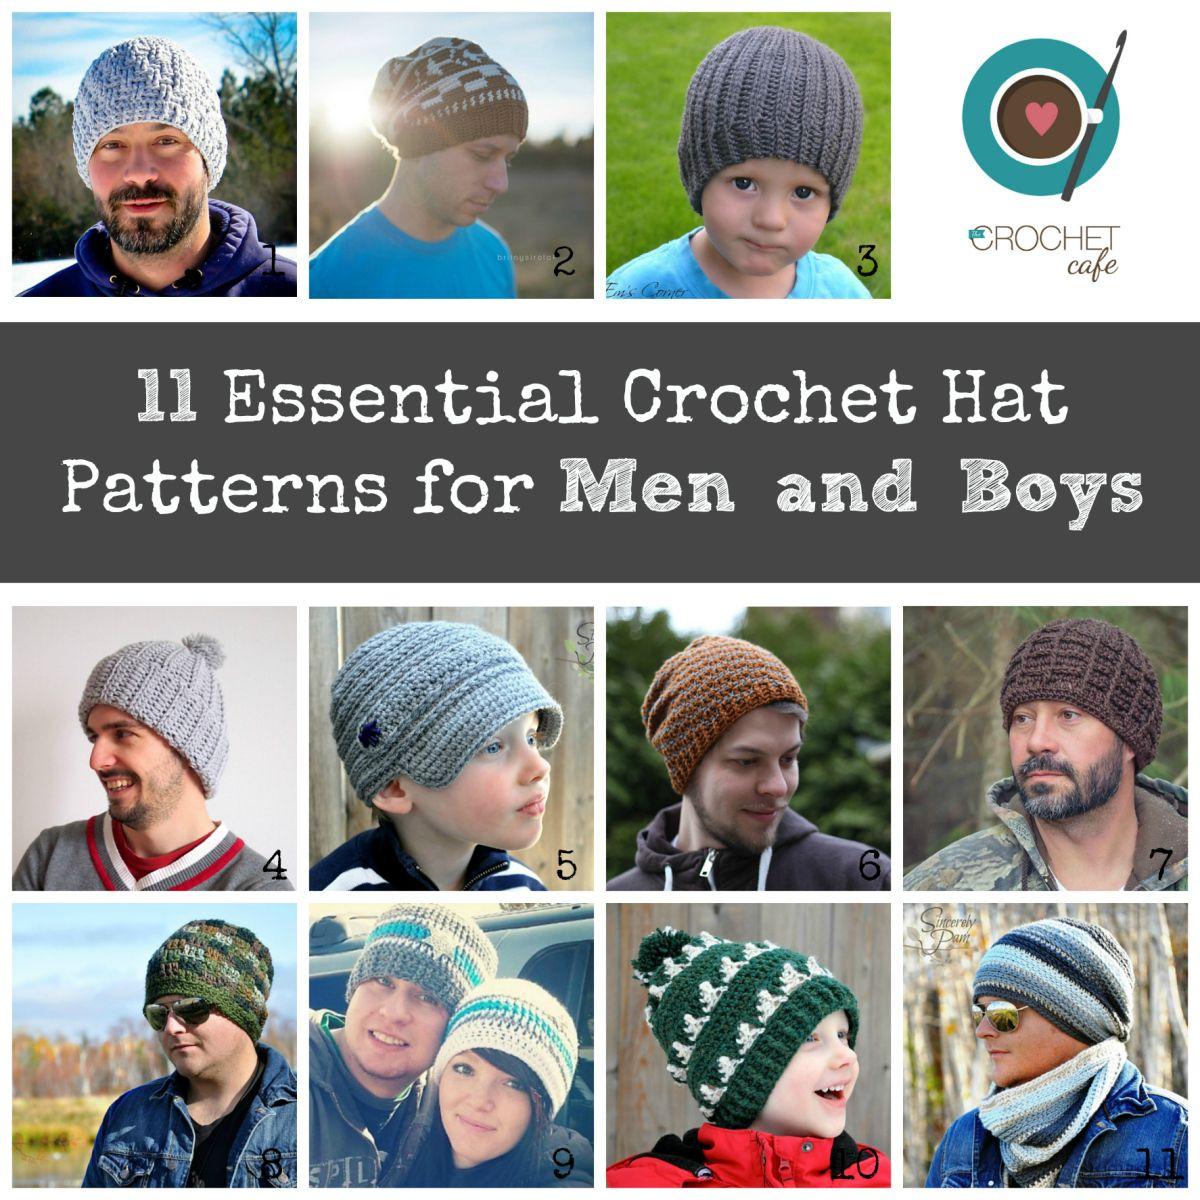 Crochet hat patterns for men and boys | Moogly Community Board ...